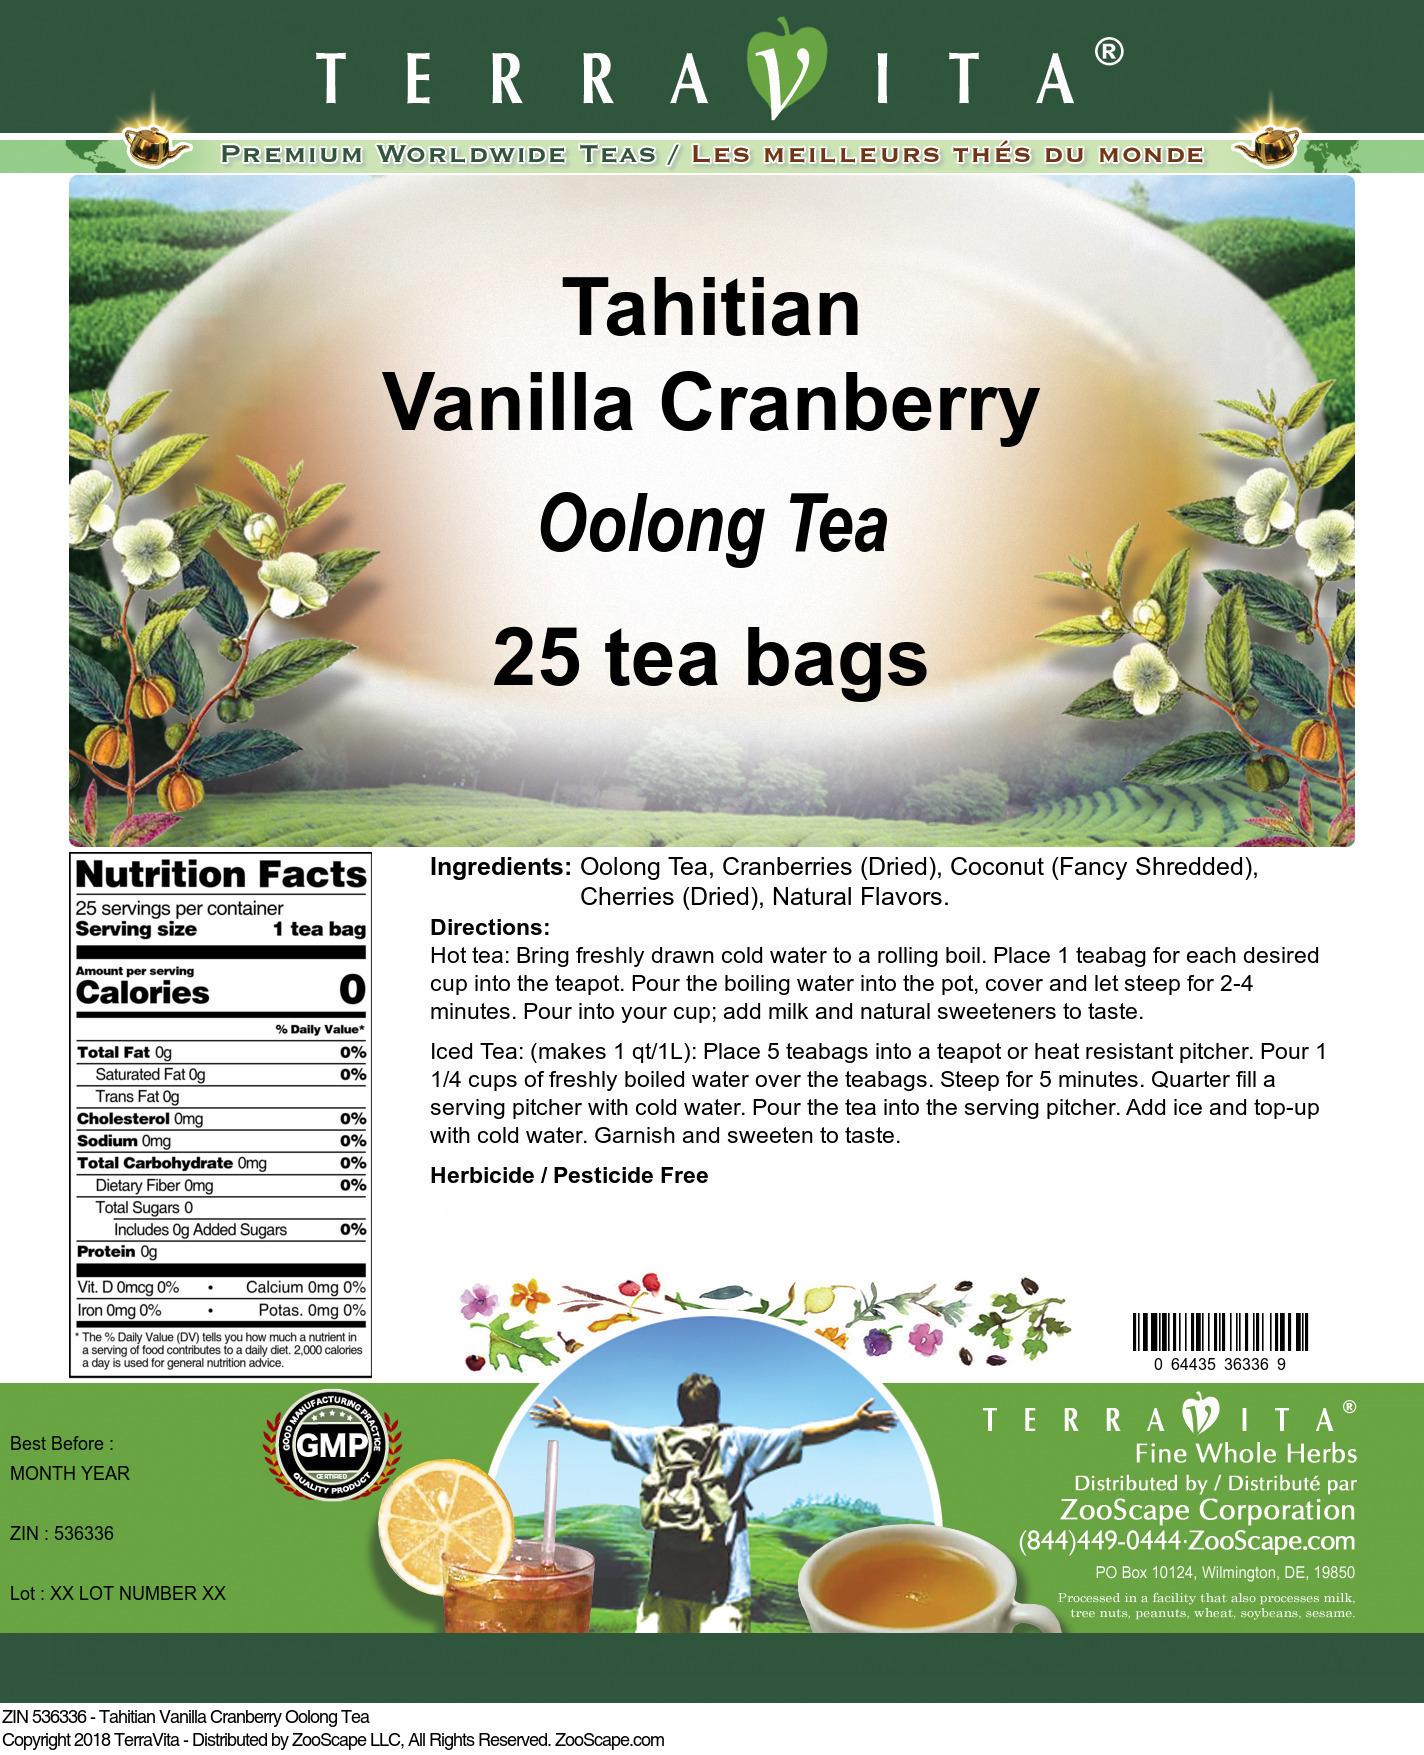 Tahitian Vanilla Cranberry Oolong Tea